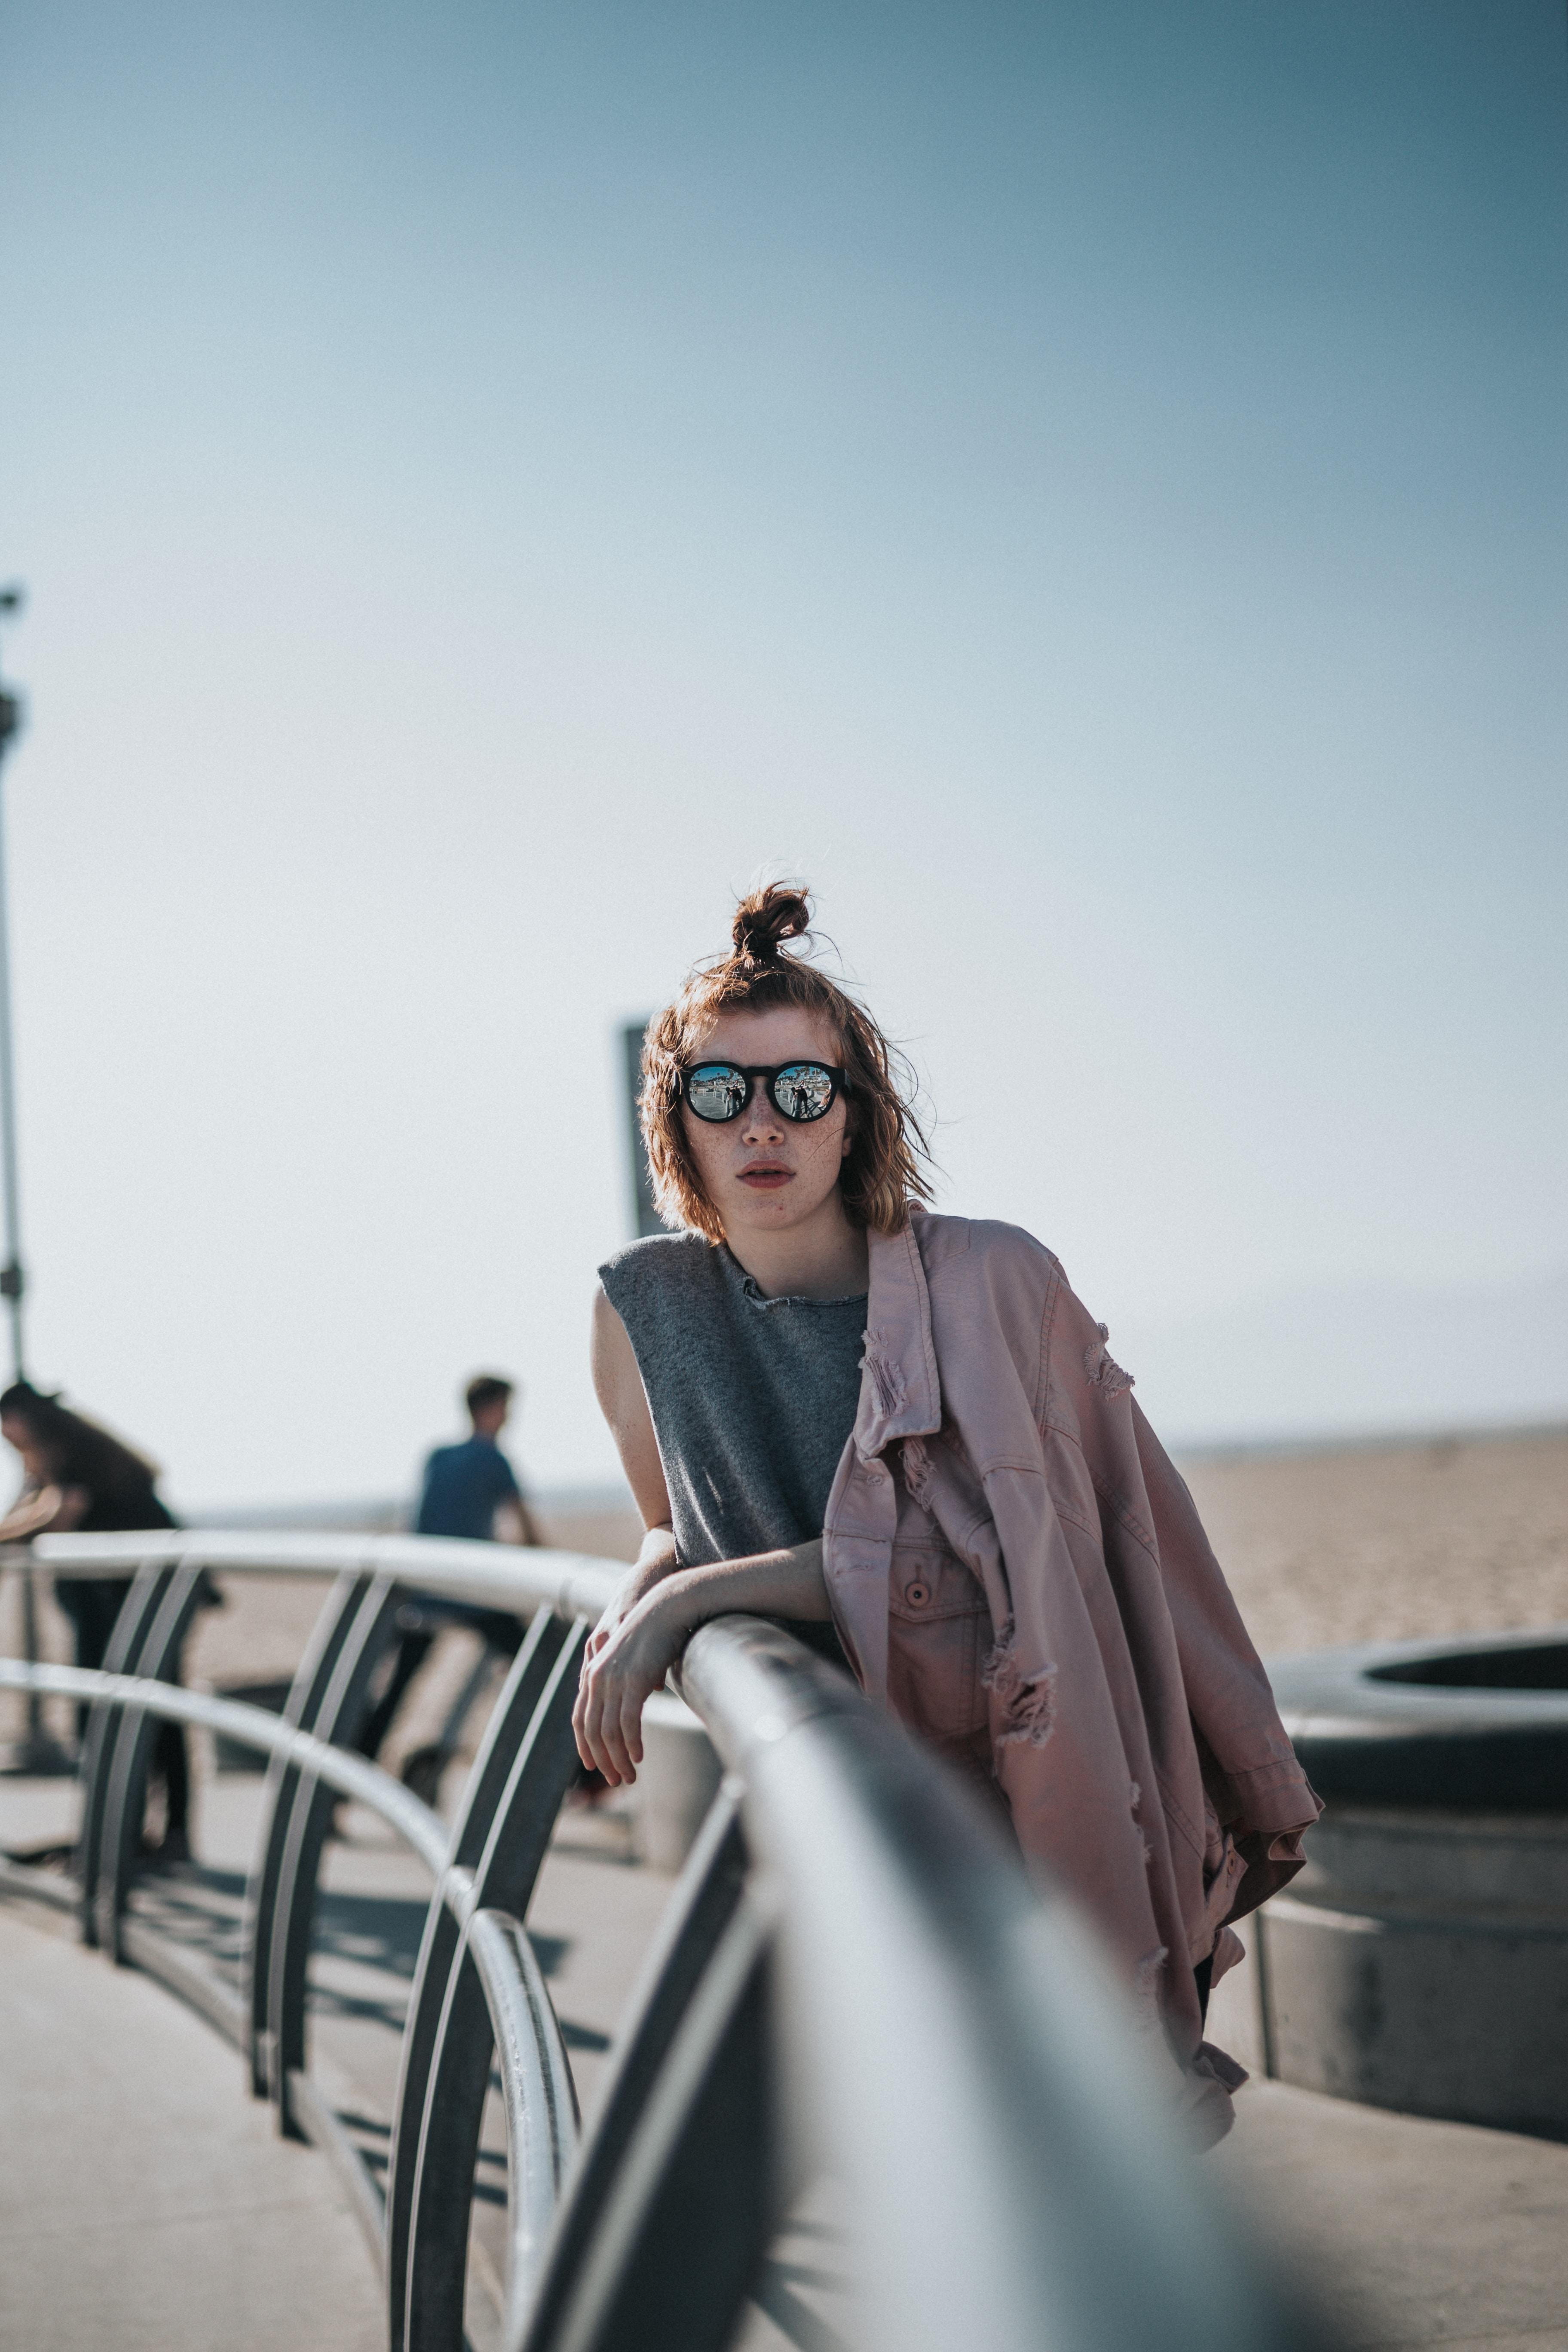 woman standing near railing wearing sunglasses at daytime